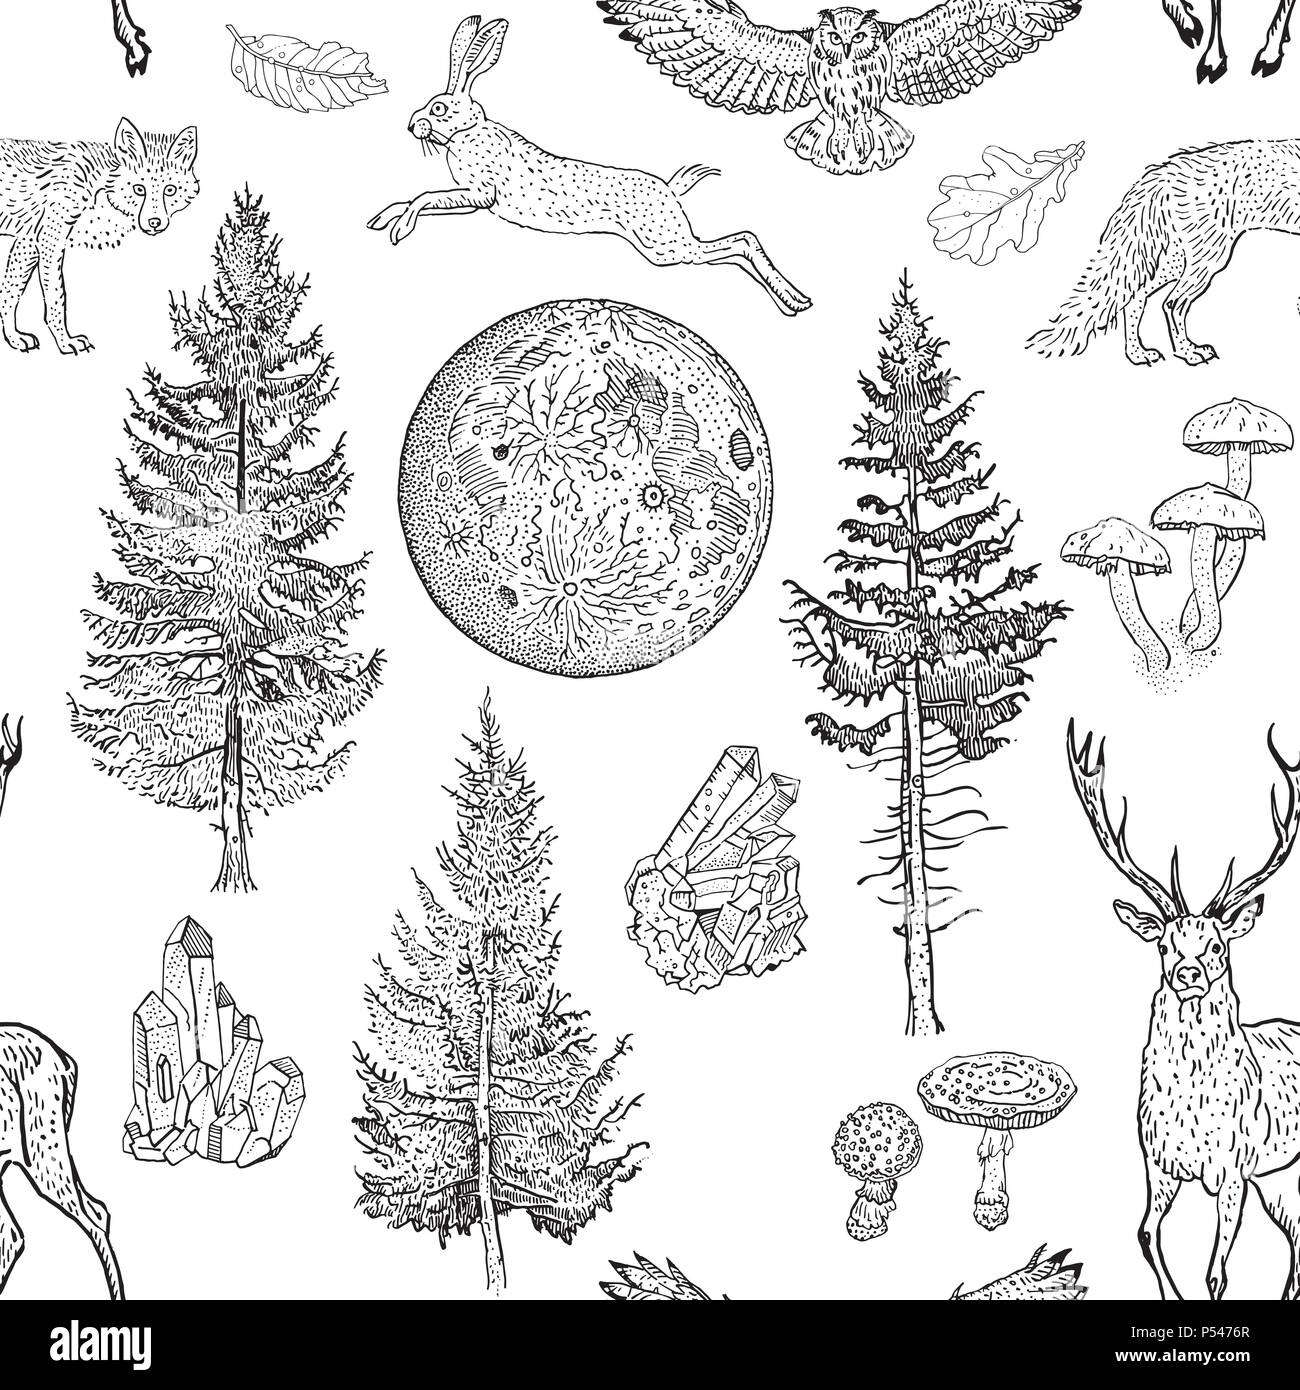 Full moon magic seamless pattern. Spruce, fir tree, mushrooms, fox, hare, deer, leaves, crystals. Hand drawn vintage tattoo engraving style vector illustration black on white. Nature, fantasy, boho. - Stock Vector